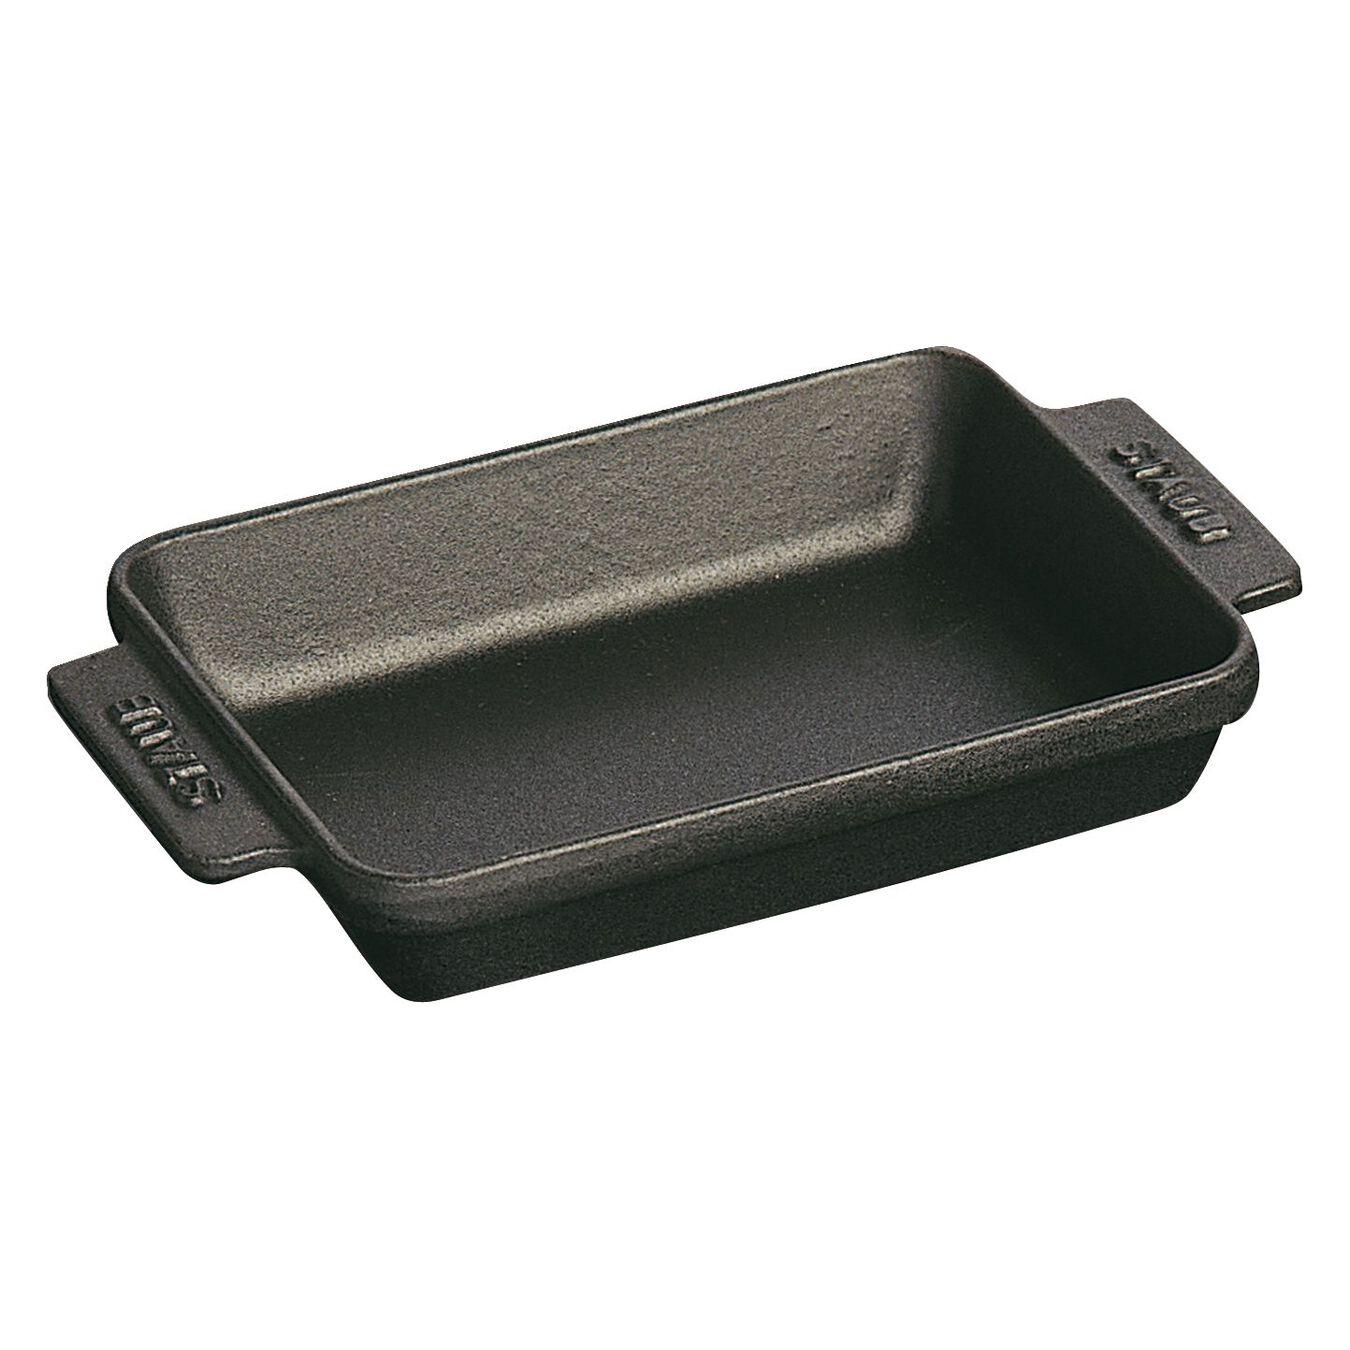 5.5-x 4.5-inch, rectangular, Mini Baker, black matte,,large 1